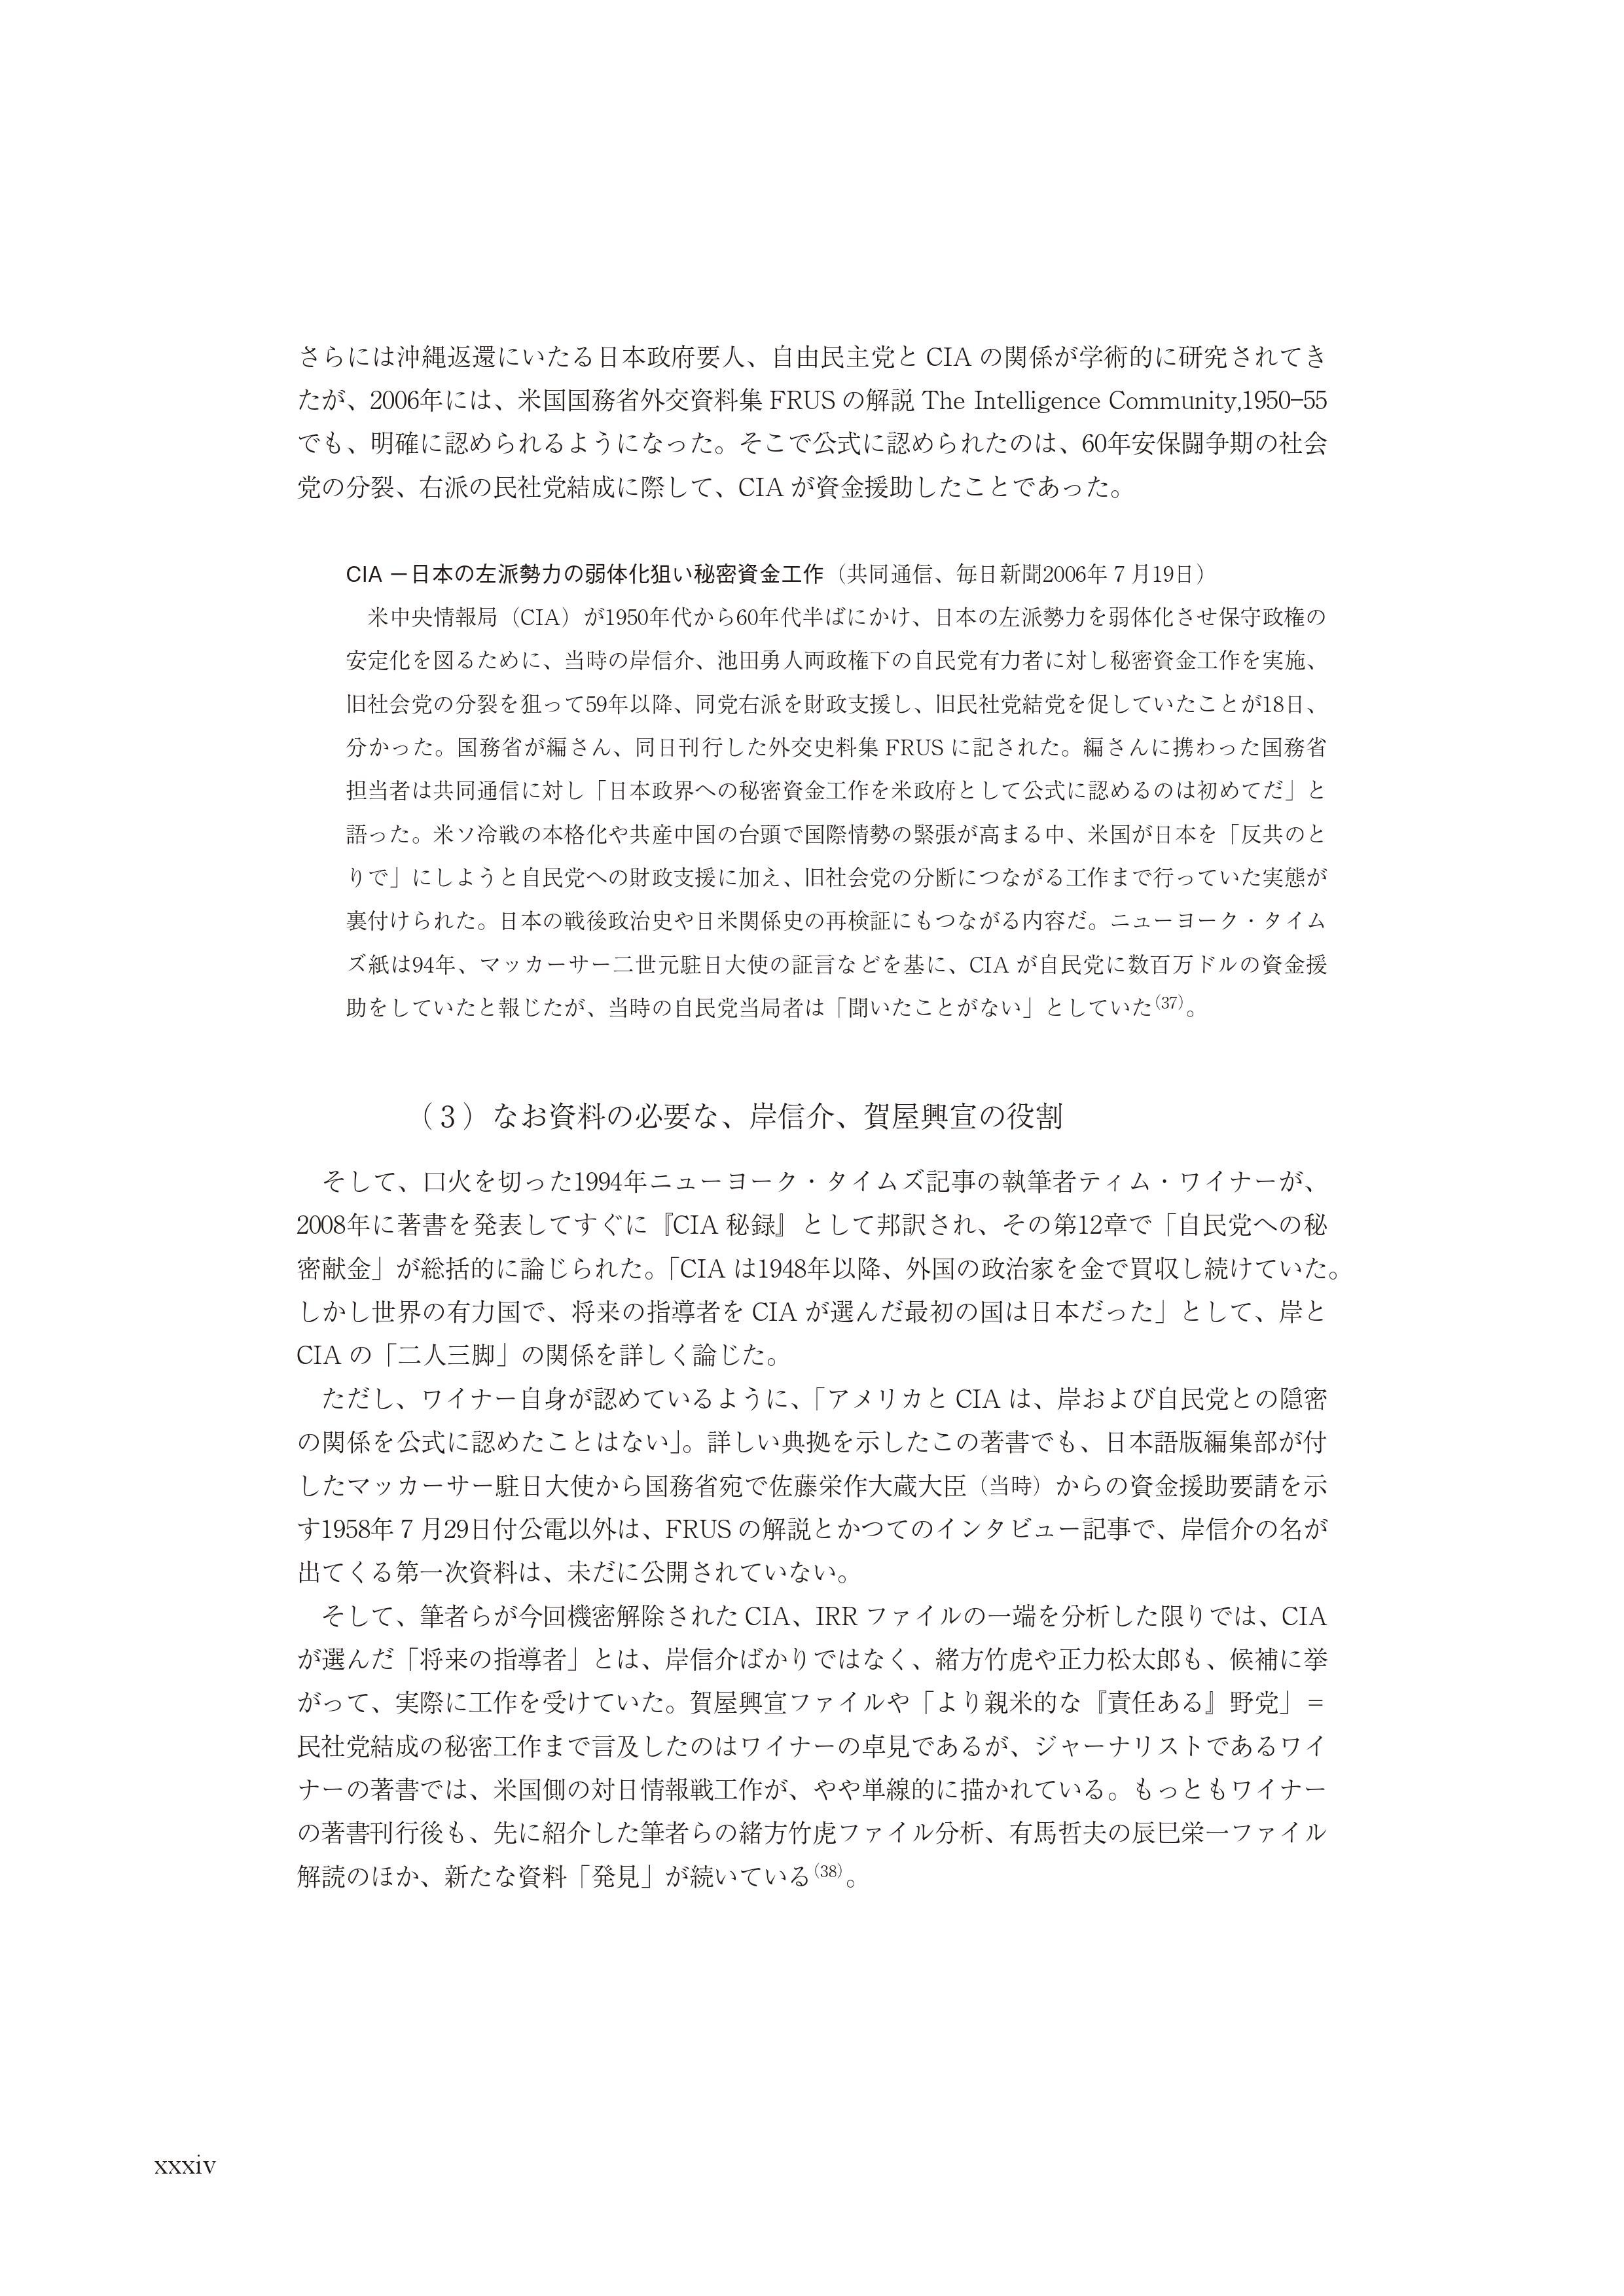 CIA日本人ファイル0001 (34)